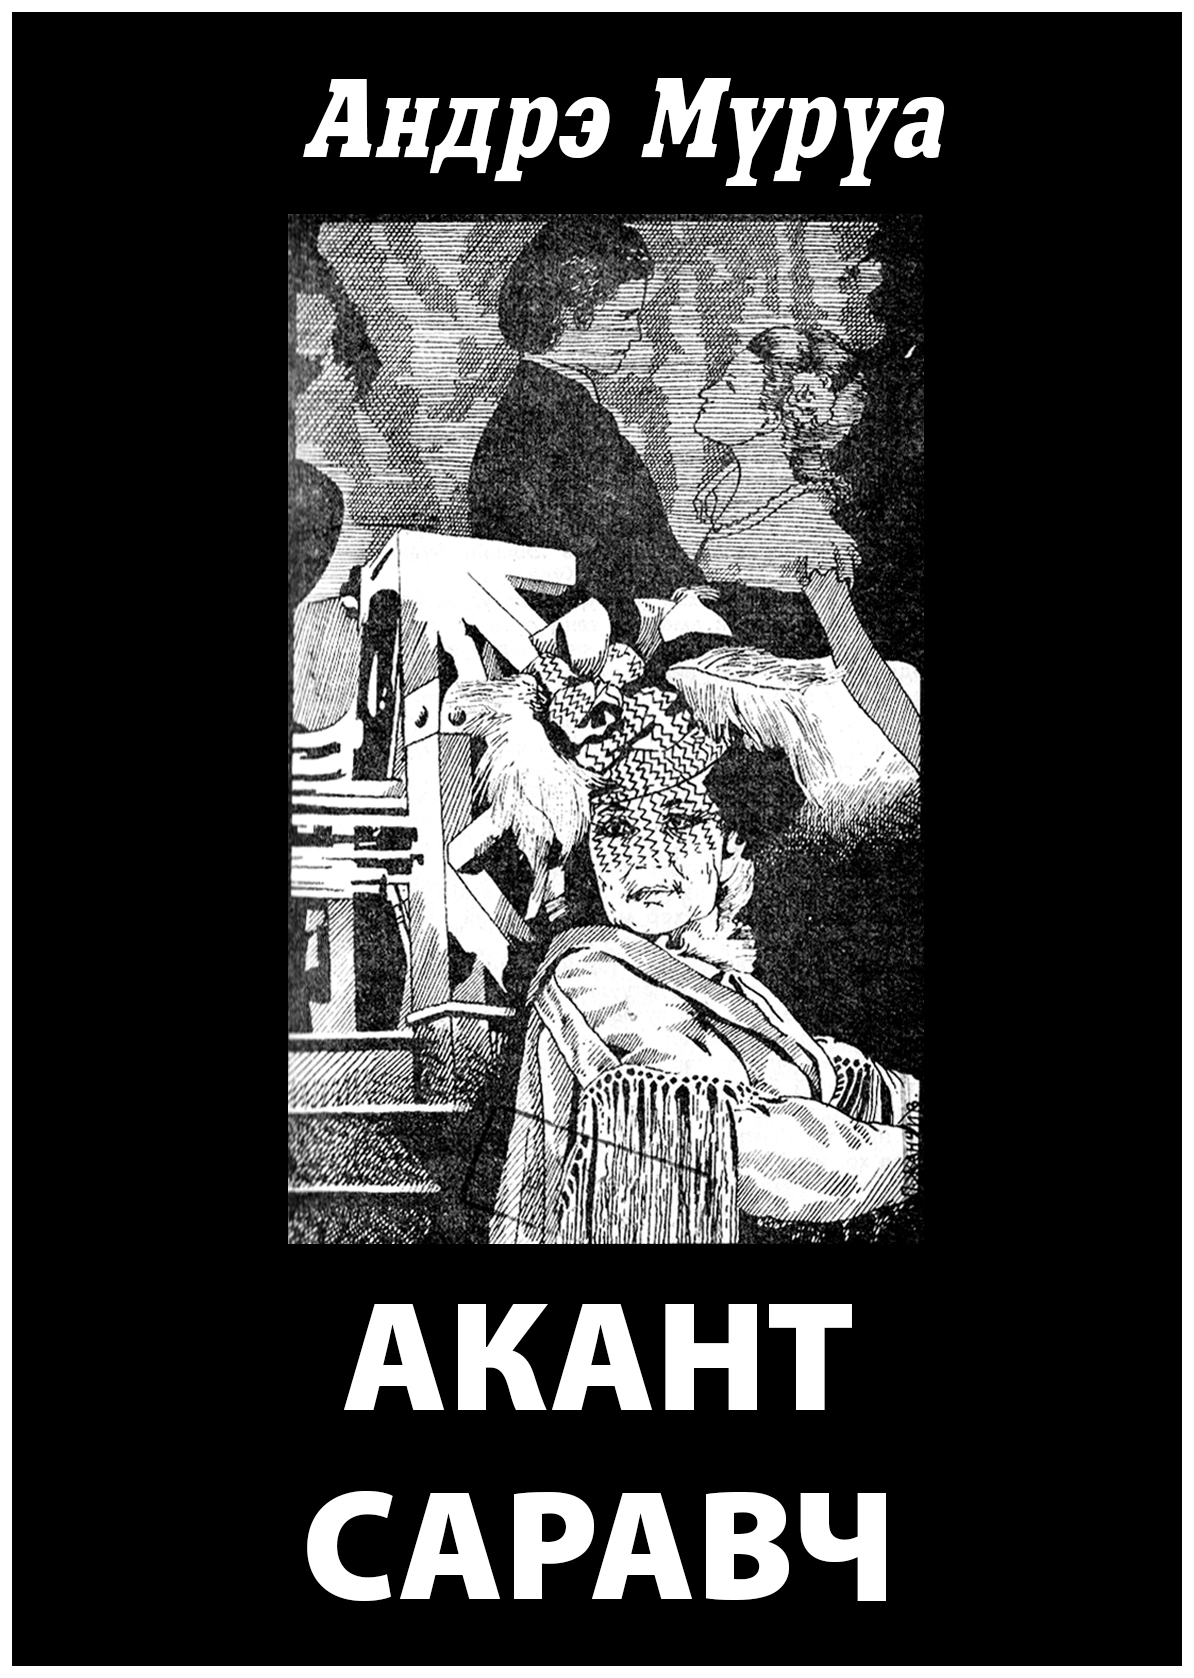 АКАНТ САРАВЧ